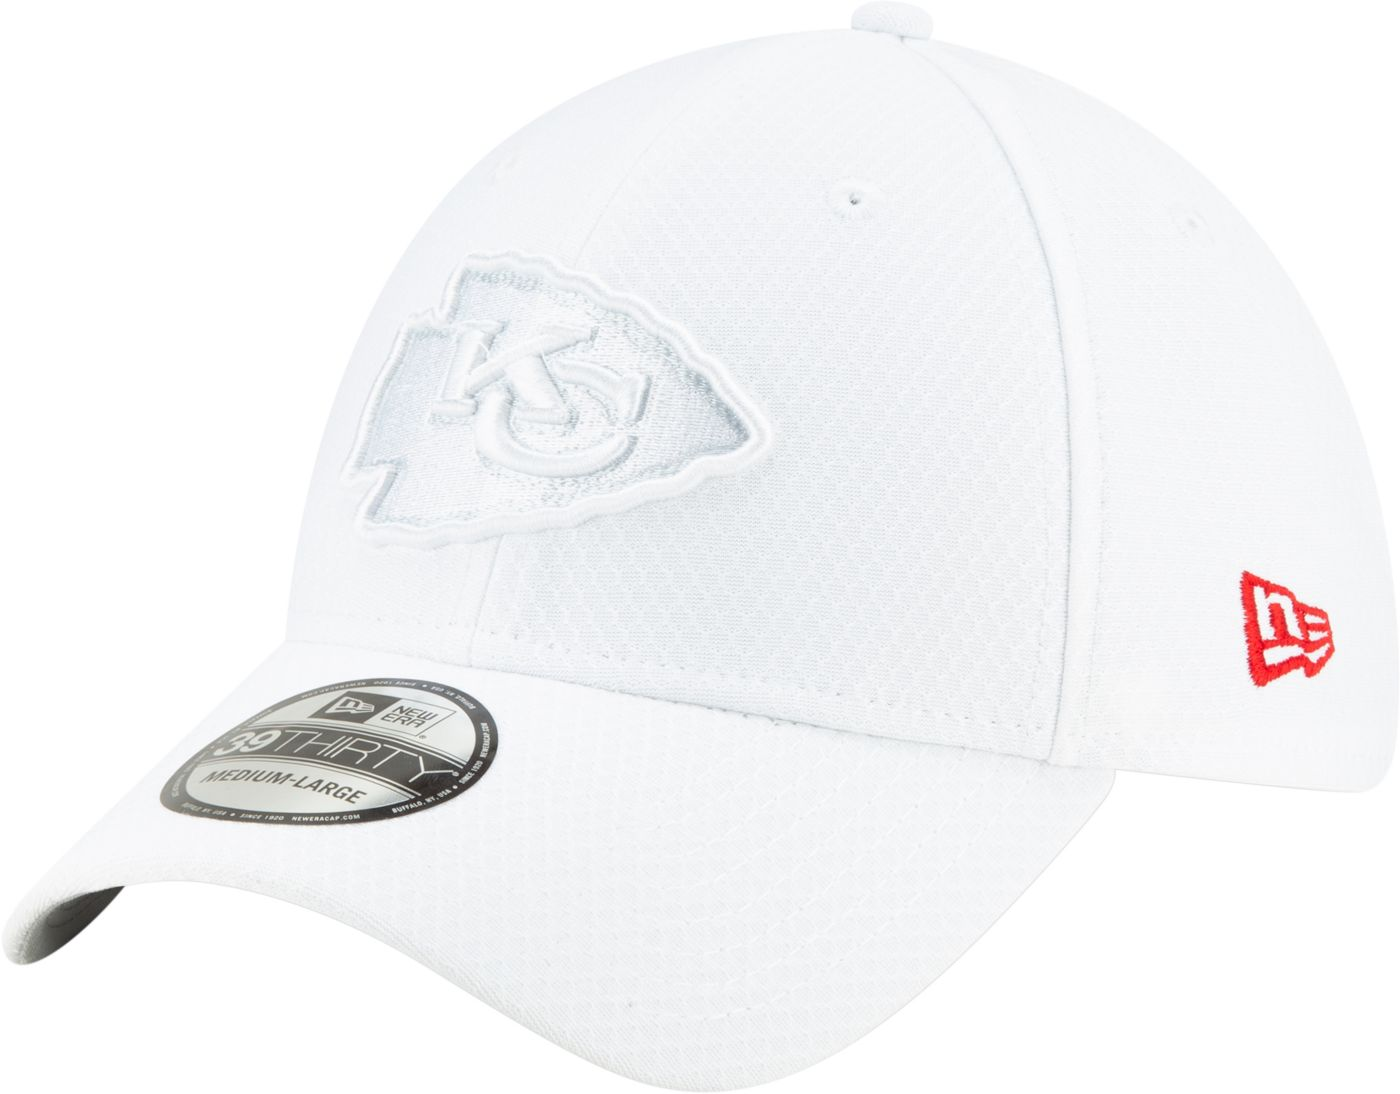 New Era Men's Kansas City Chiefs Sideline 100th 39Thirty Stretch Fit White Hat